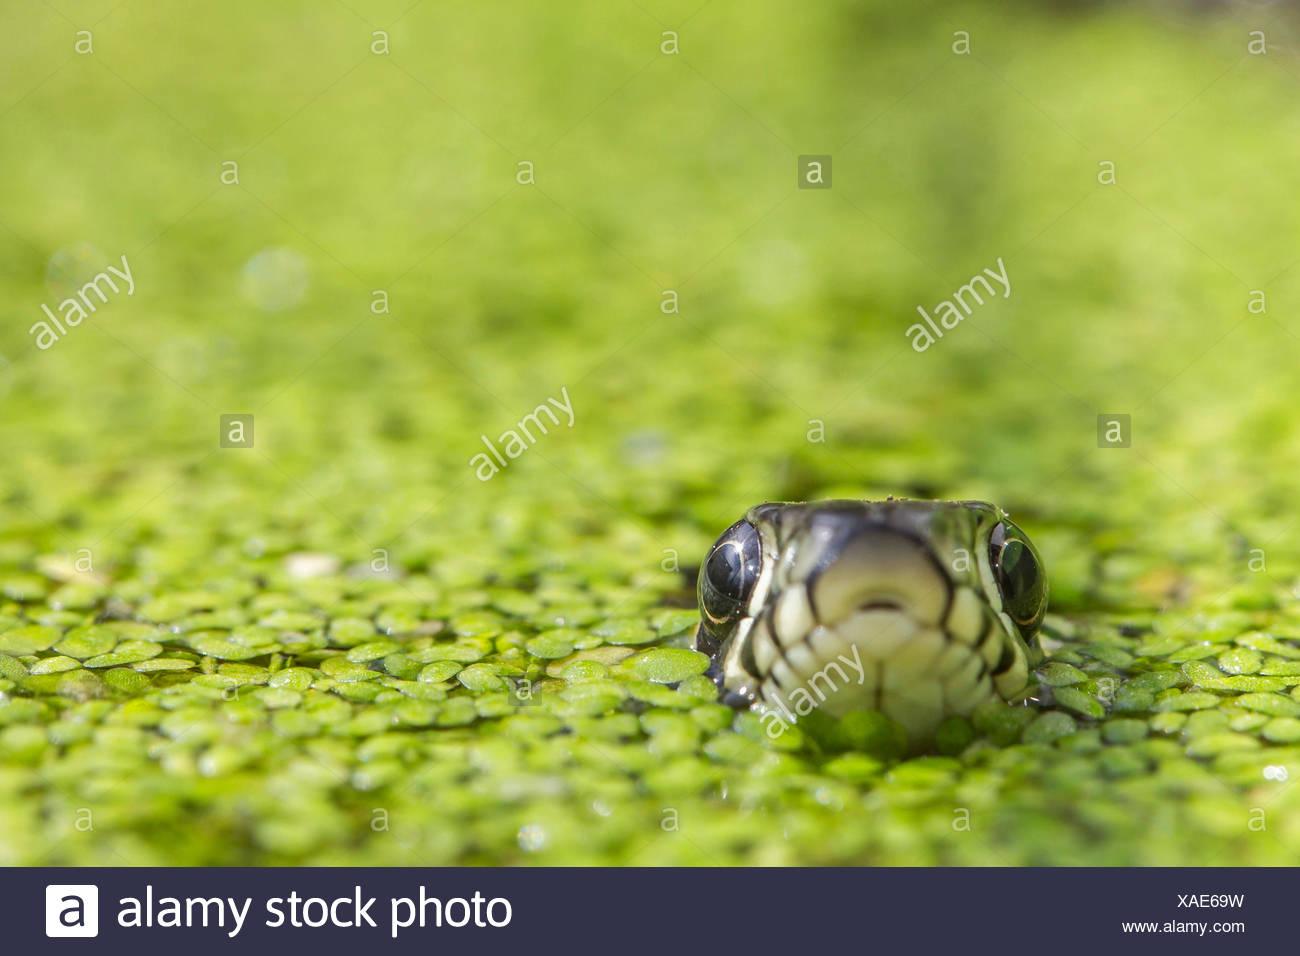 grass snake (Natrix natrix), surfacing between duckweeds, portrait, Germany, Bavaria, Niederbayern, Lower Bavaria - Stock Image